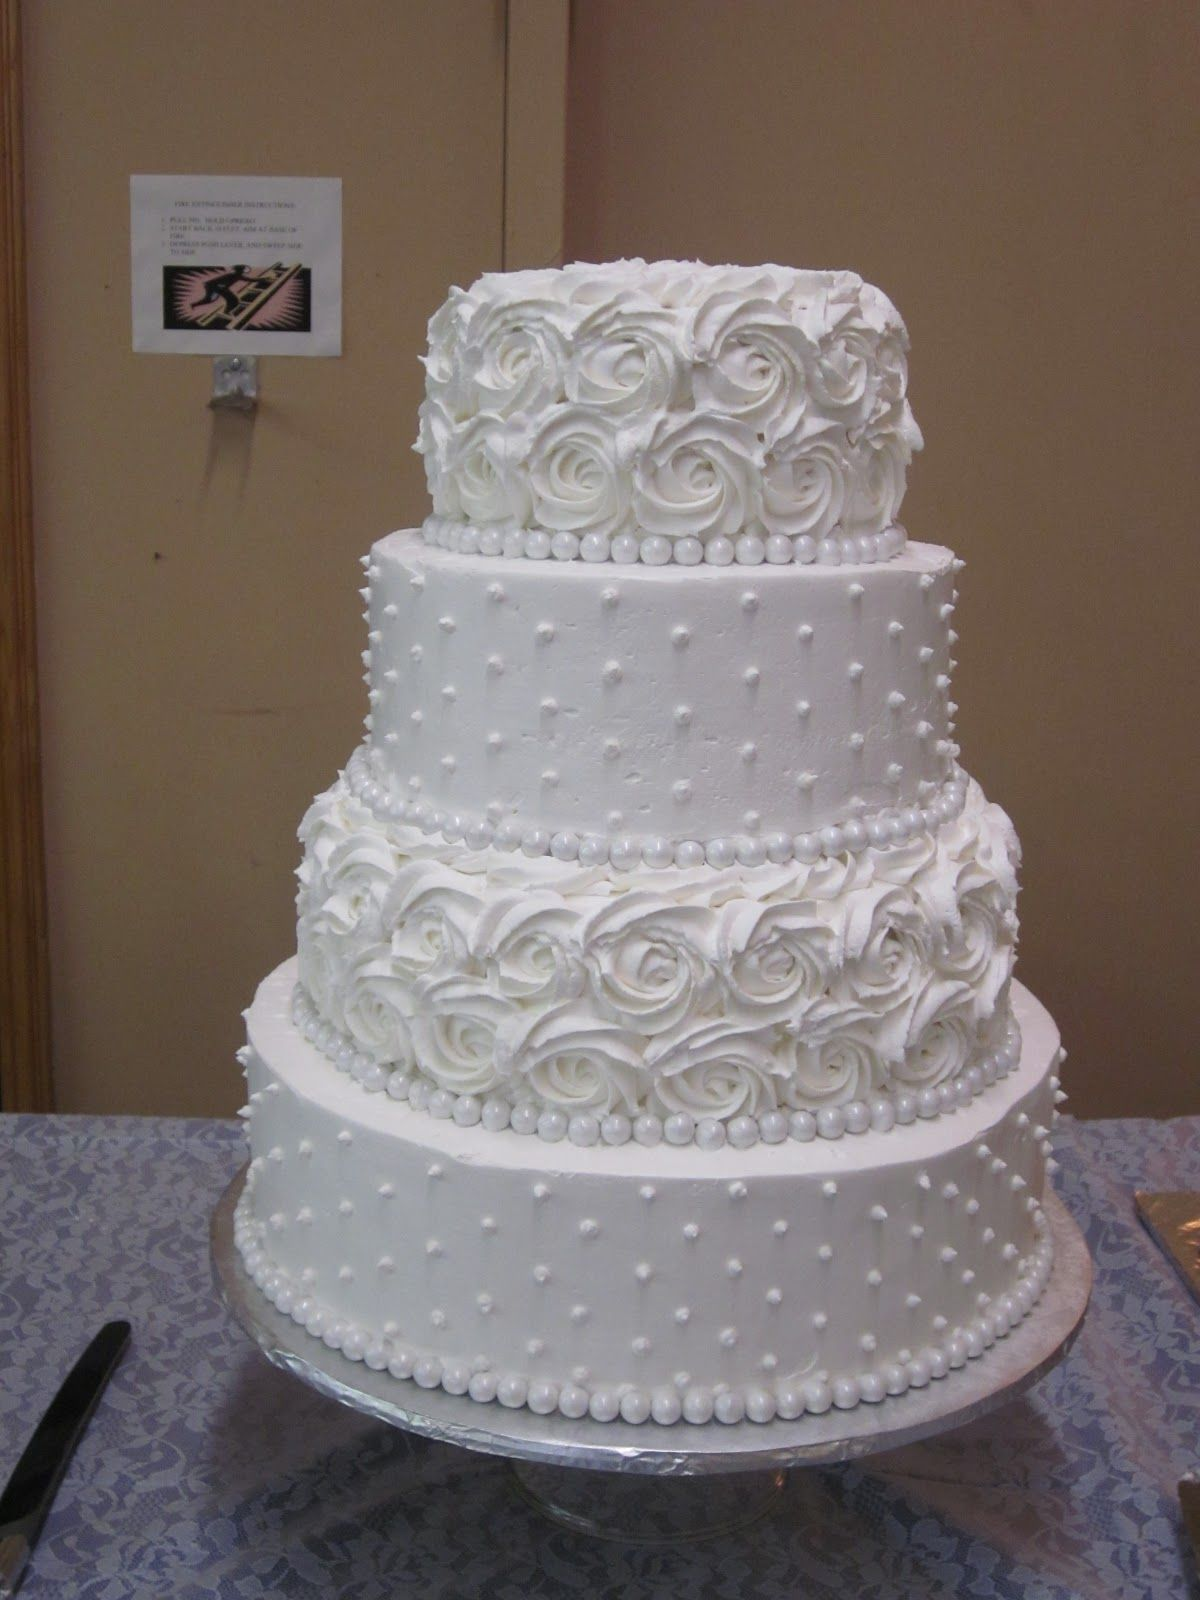 kroger wedding cakes only wish it crusted like traditional buttercreams do karlie girl. Black Bedroom Furniture Sets. Home Design Ideas